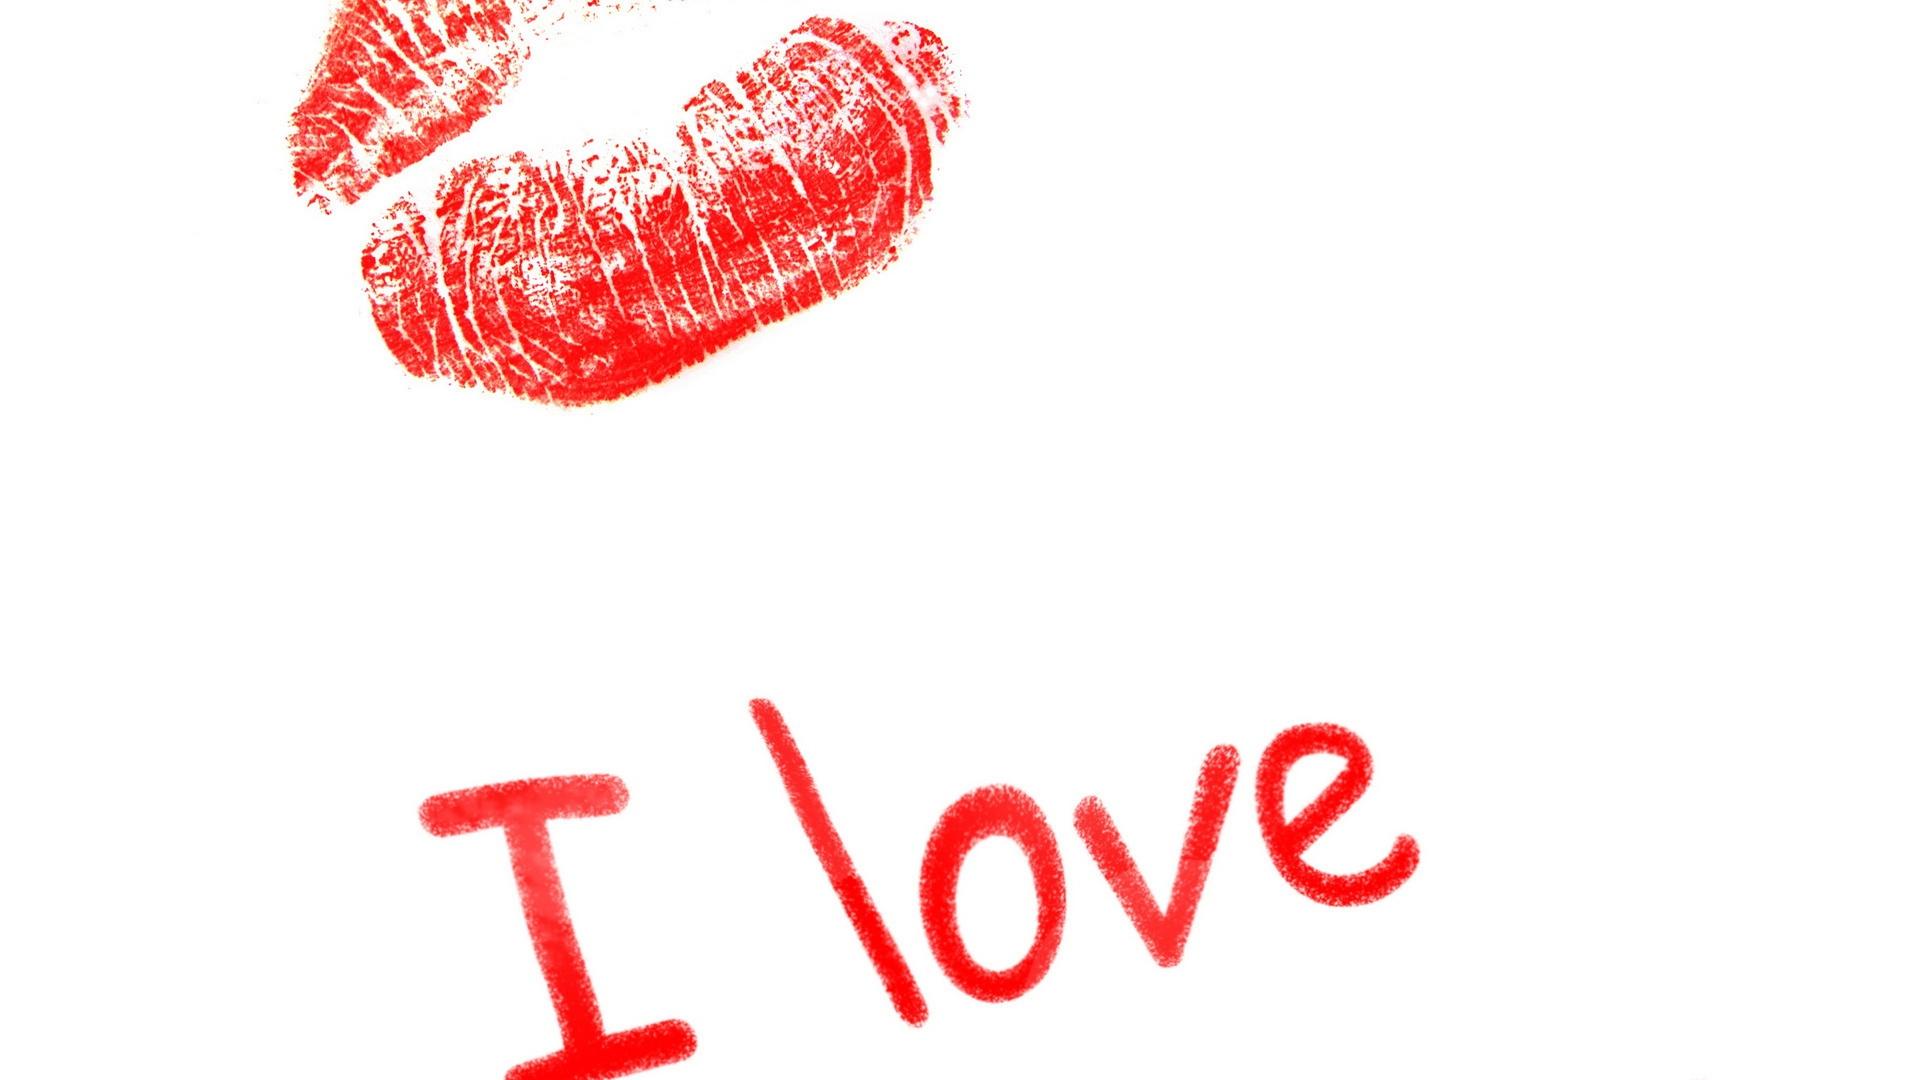 Download Wallpaper 1920x1080 Kiss Lips Lettering Love